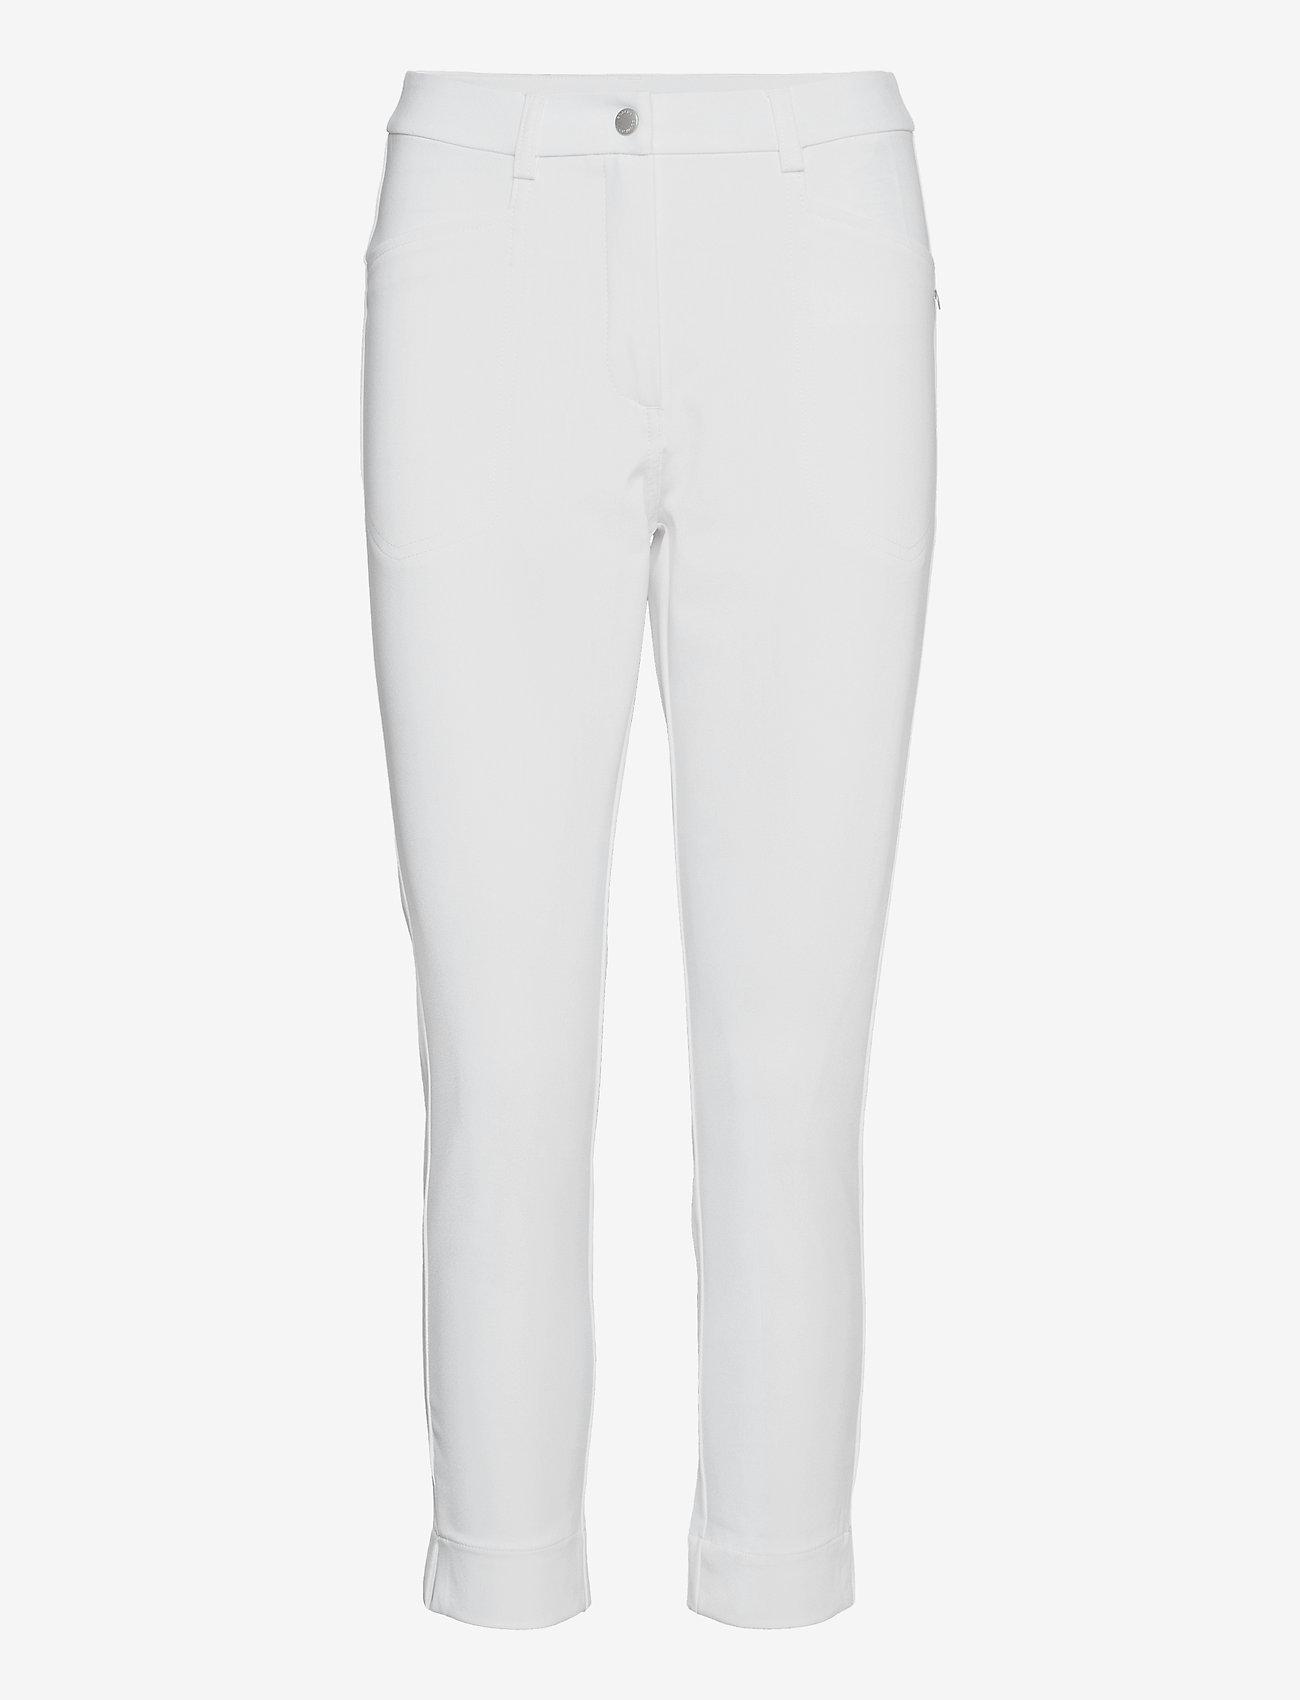 Abacus - Lds Grace high waist 7/8 trousers 92cm - golfbroeken - white - 0